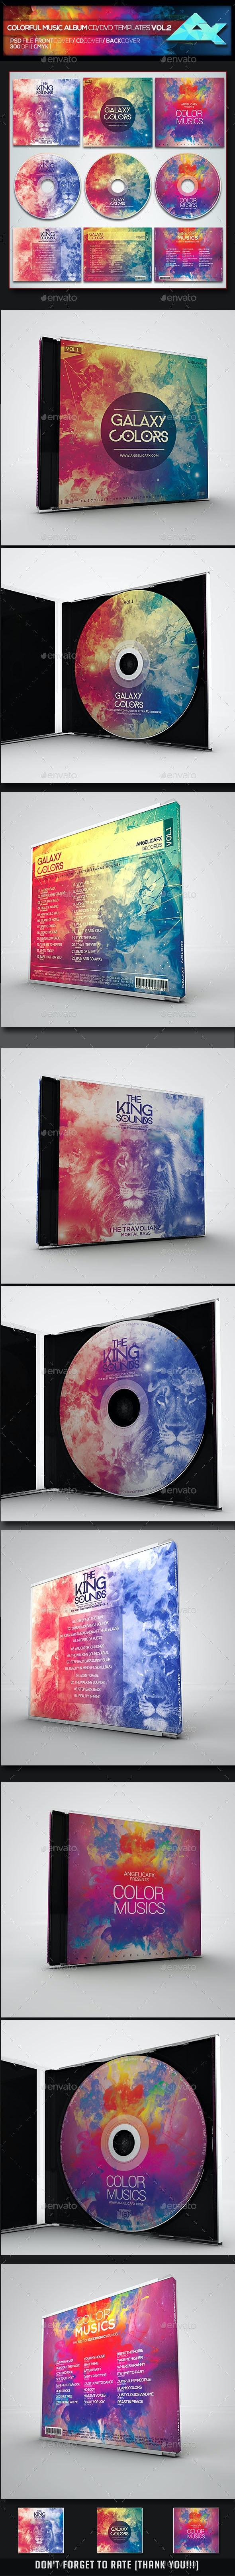 Colorful CD/DVD Album Covers Bundle Vol. 2 - CD & DVD Artwork Print Templates